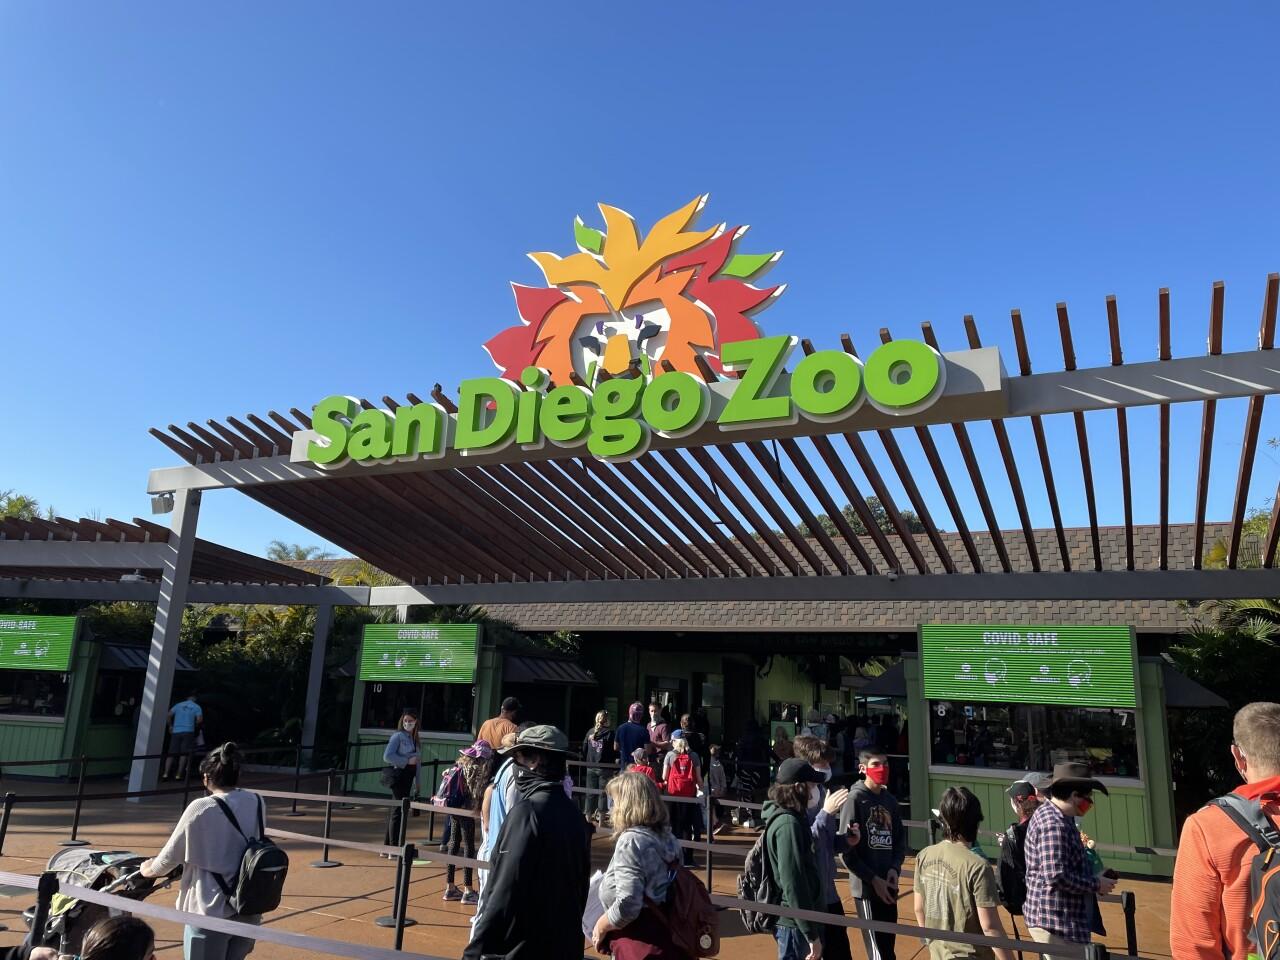 san diego zoo sign 2021.jpg